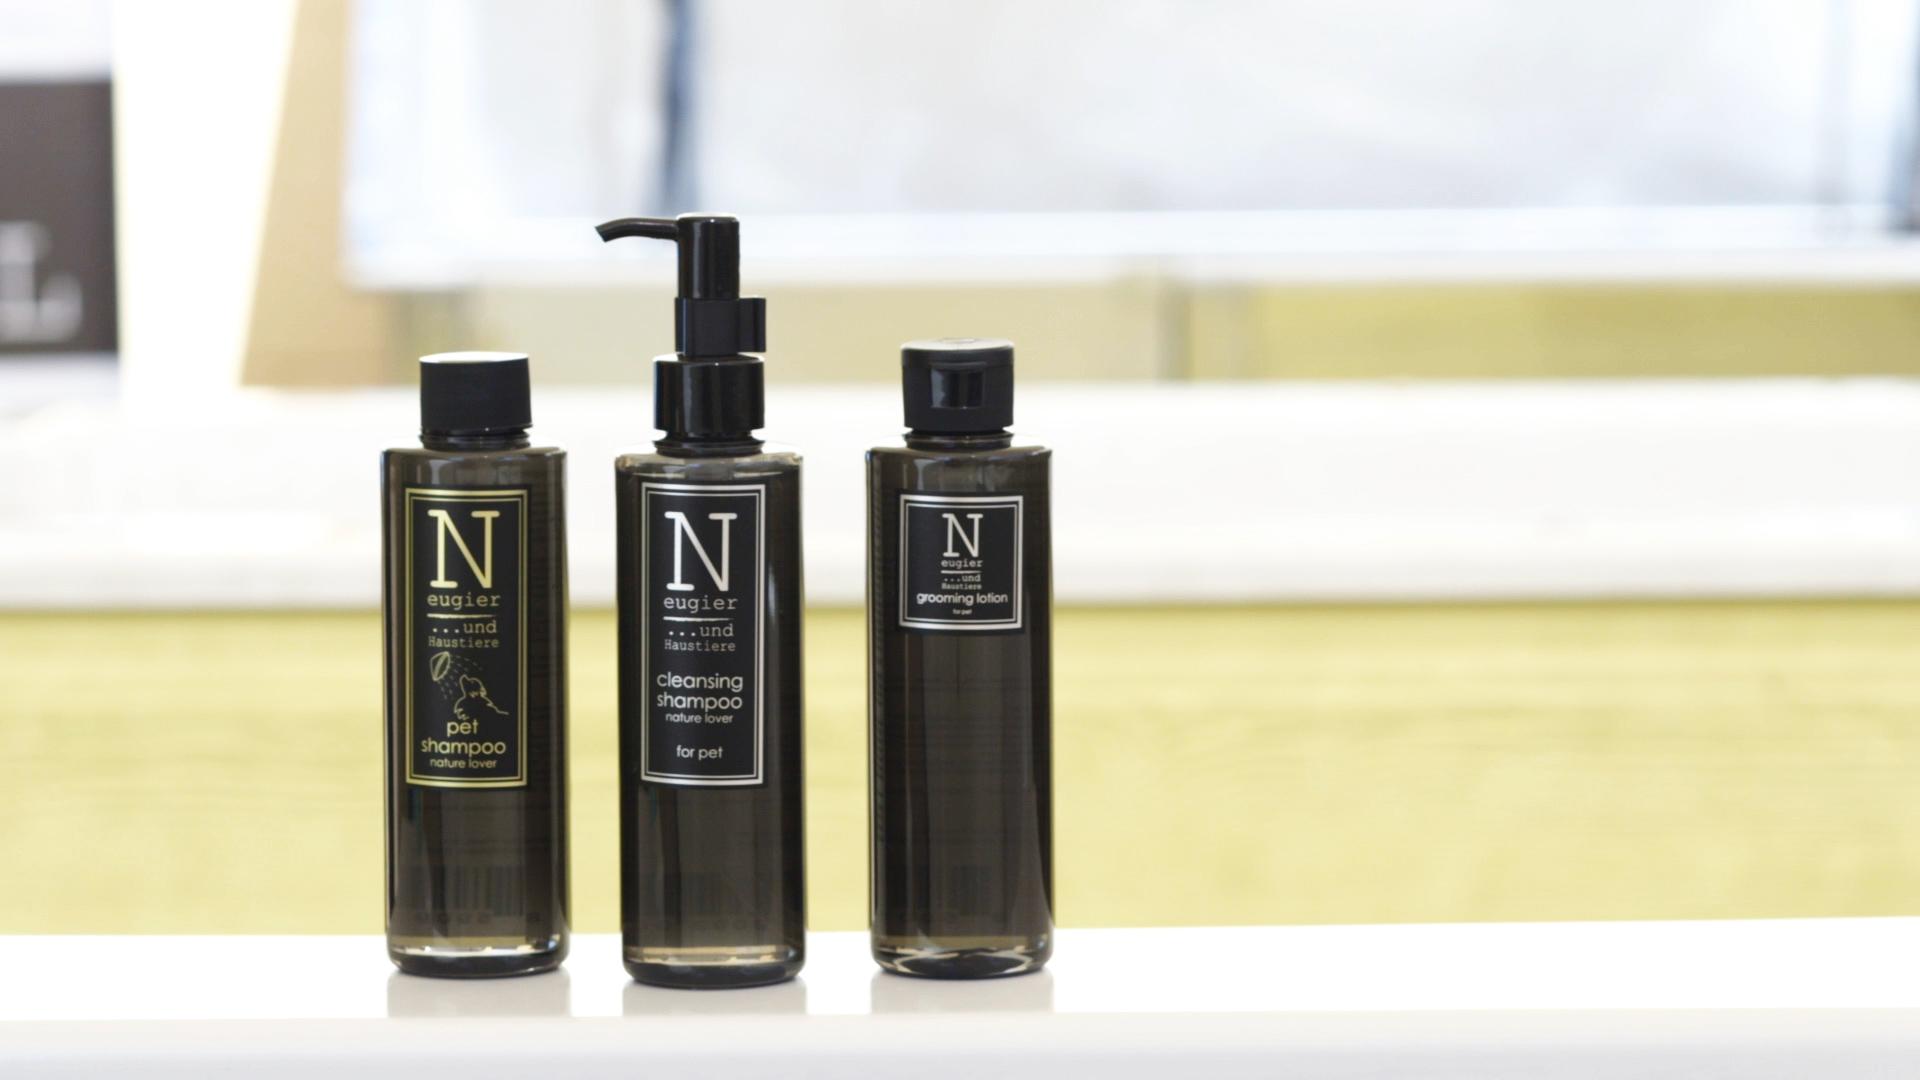 Neugier Shampoo and Cleanser - Small Bottles.jpg